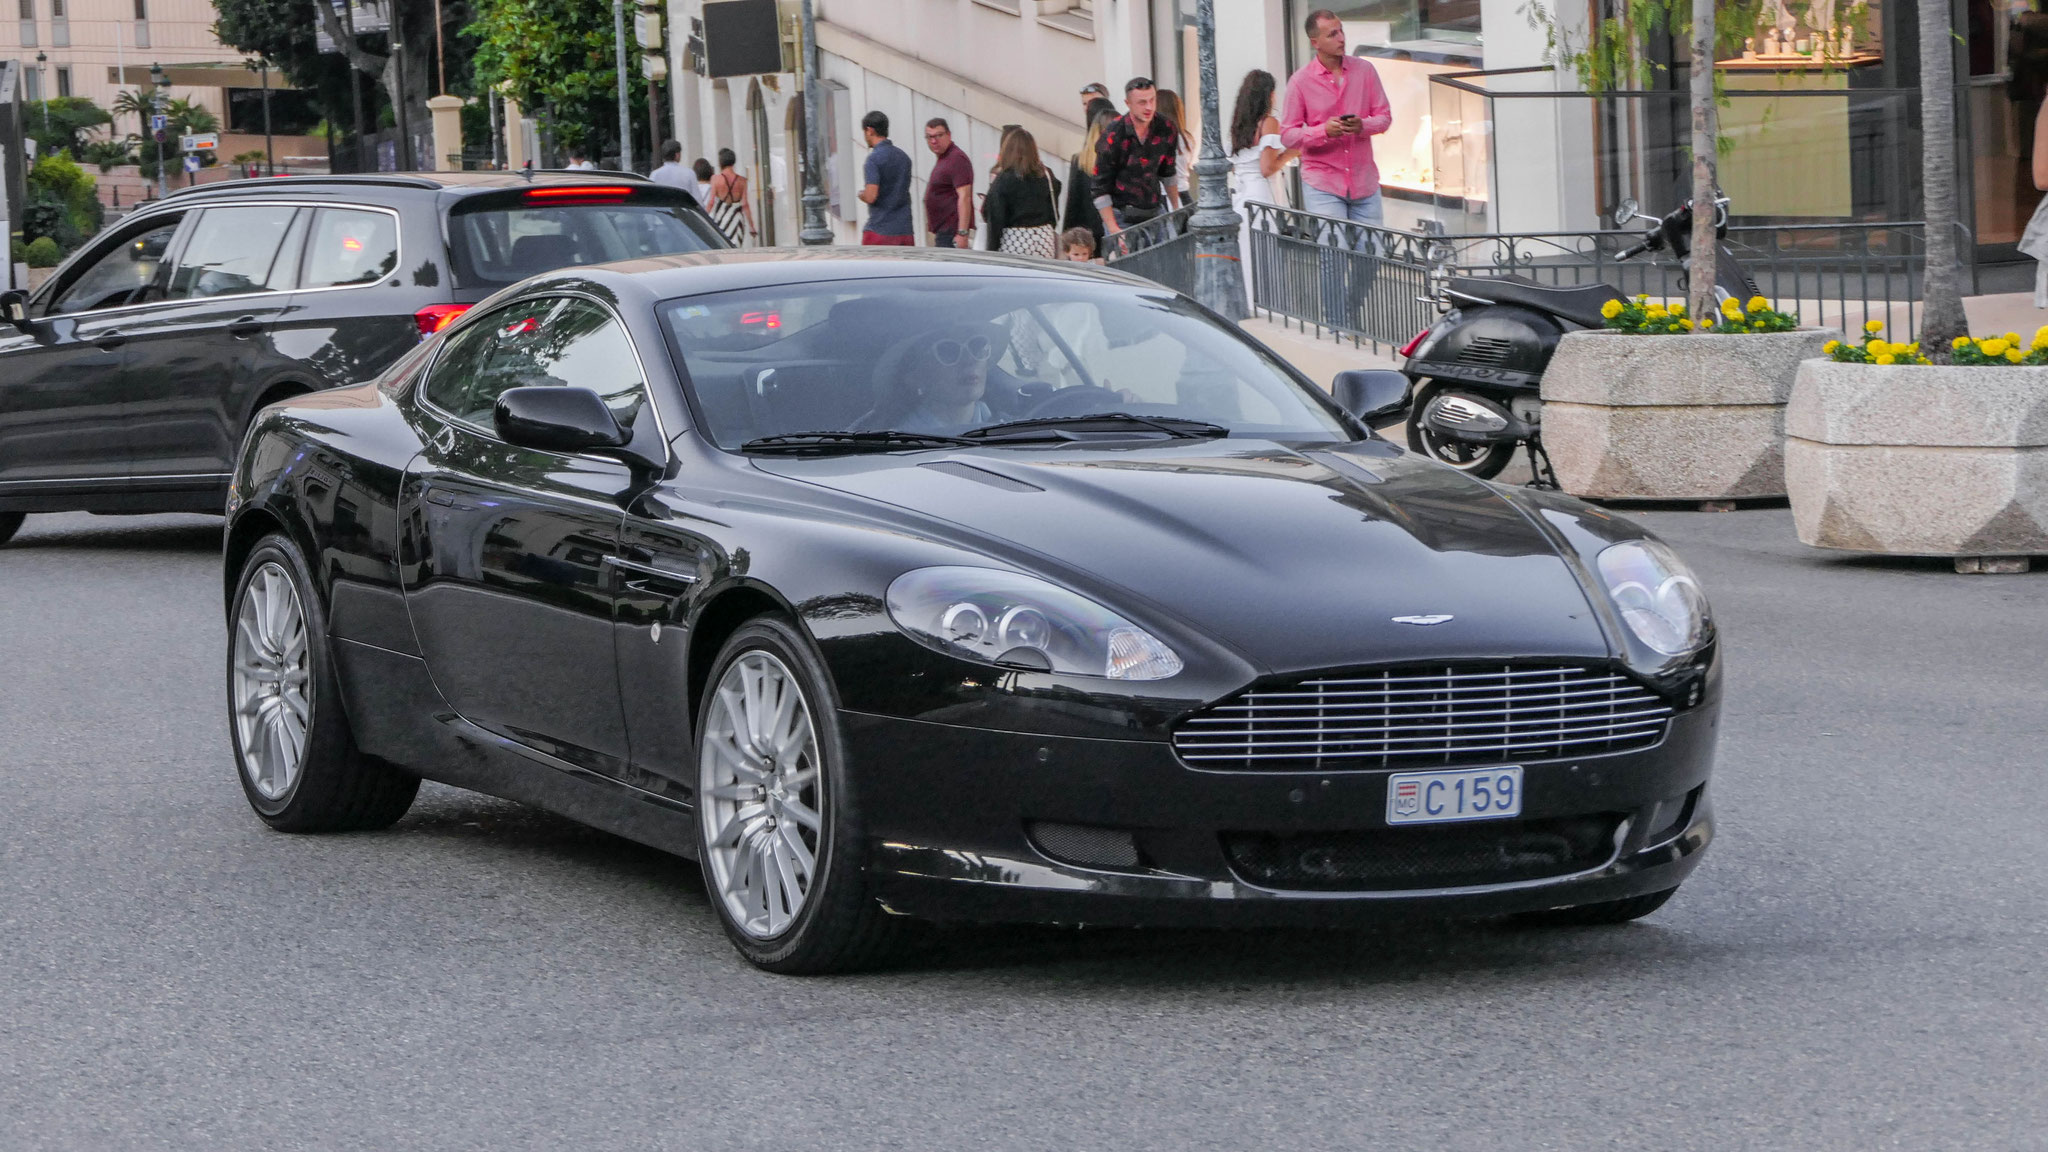 Aston Martin DB9 Coupé - C159 (MC)